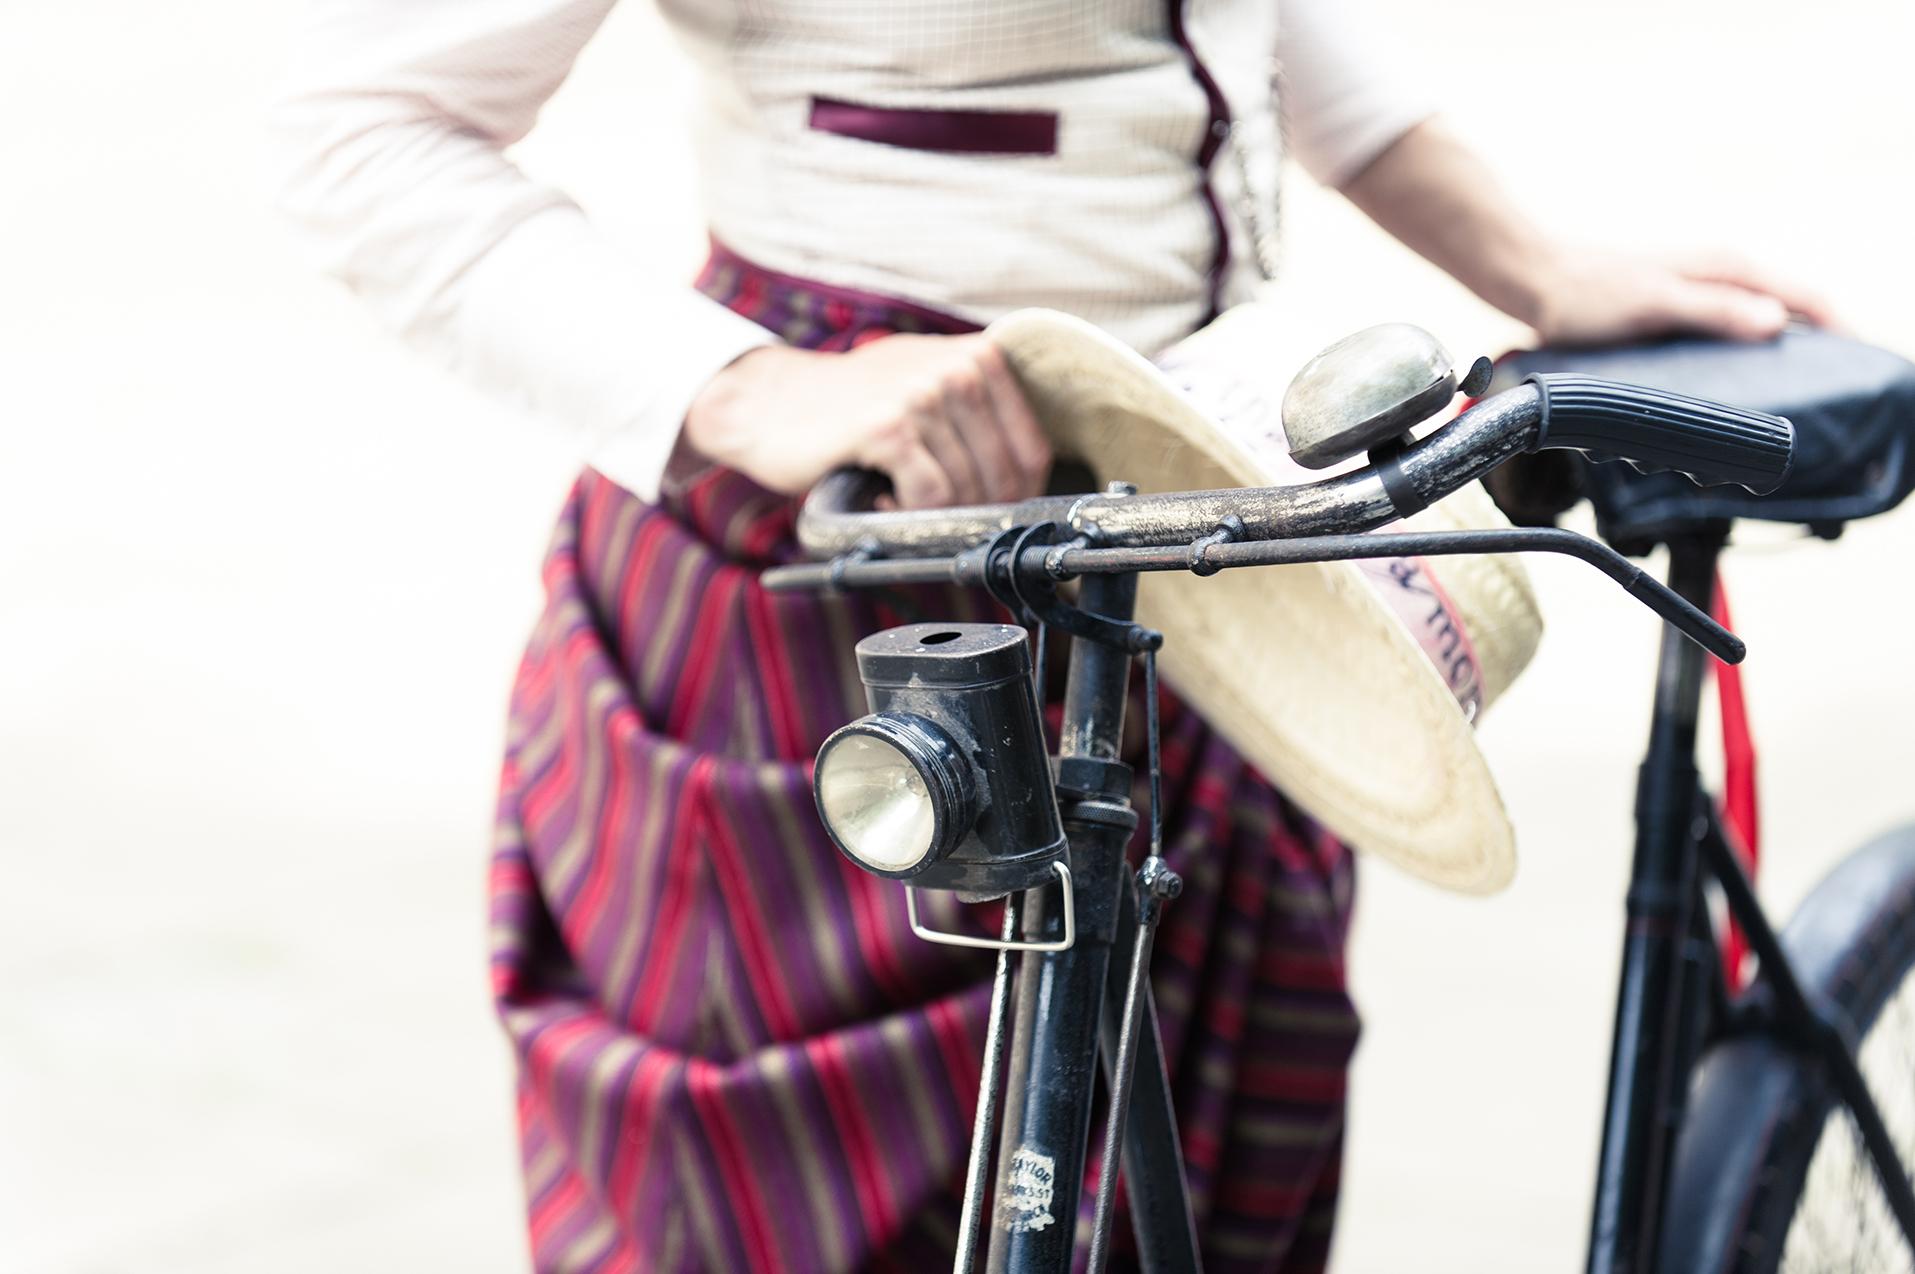 dress+bikes